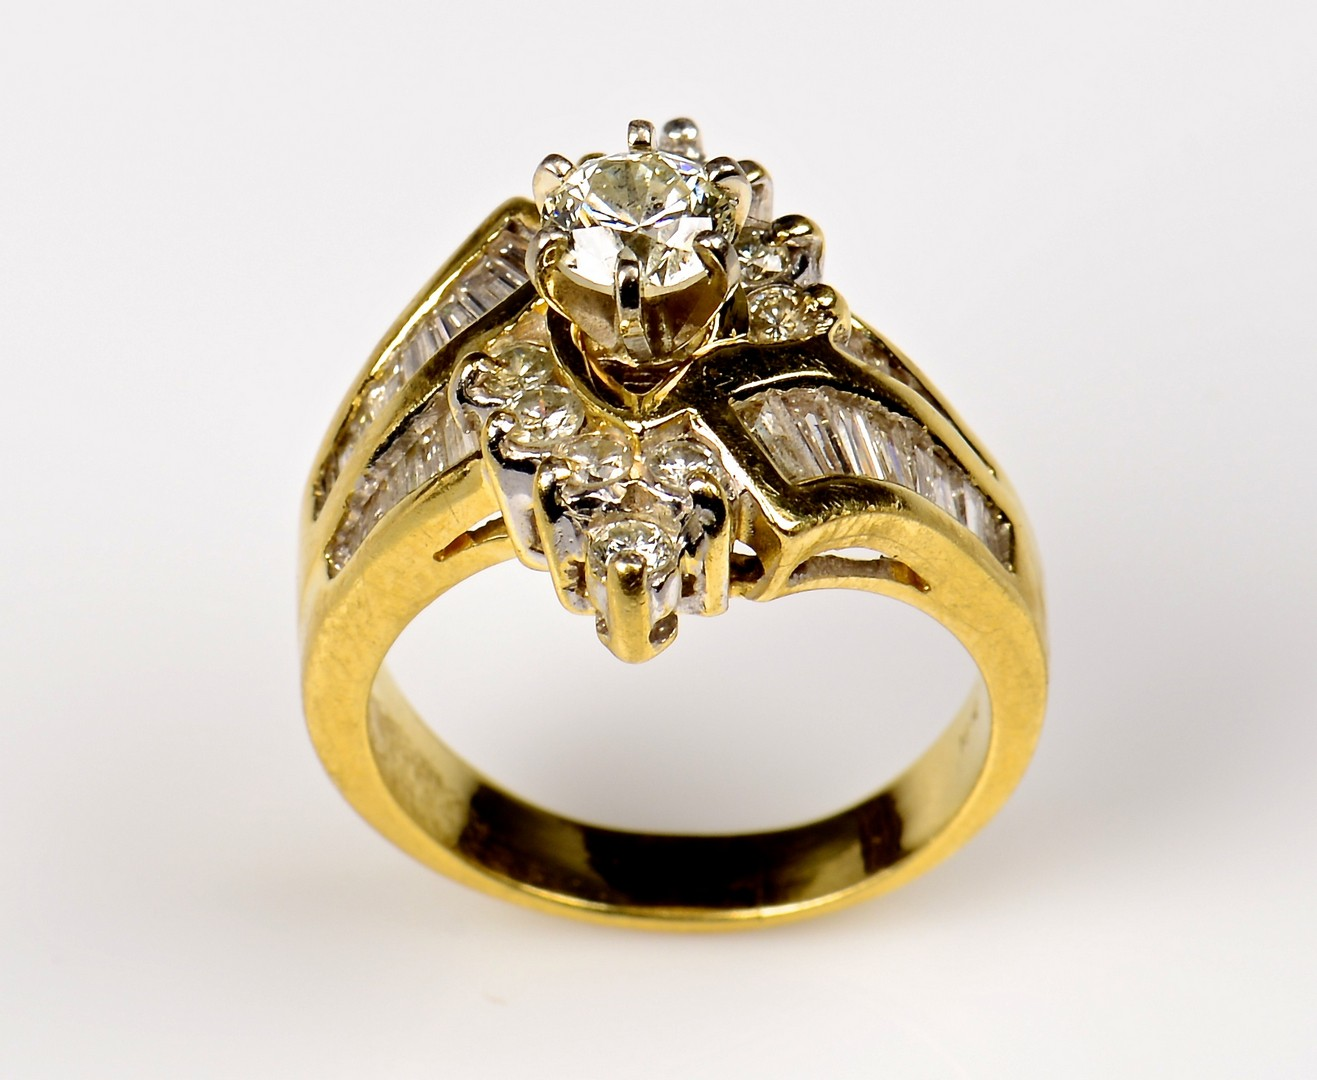 Lot 72: 18K Fashion Ring w/ .75 ct Diamond Solitaire